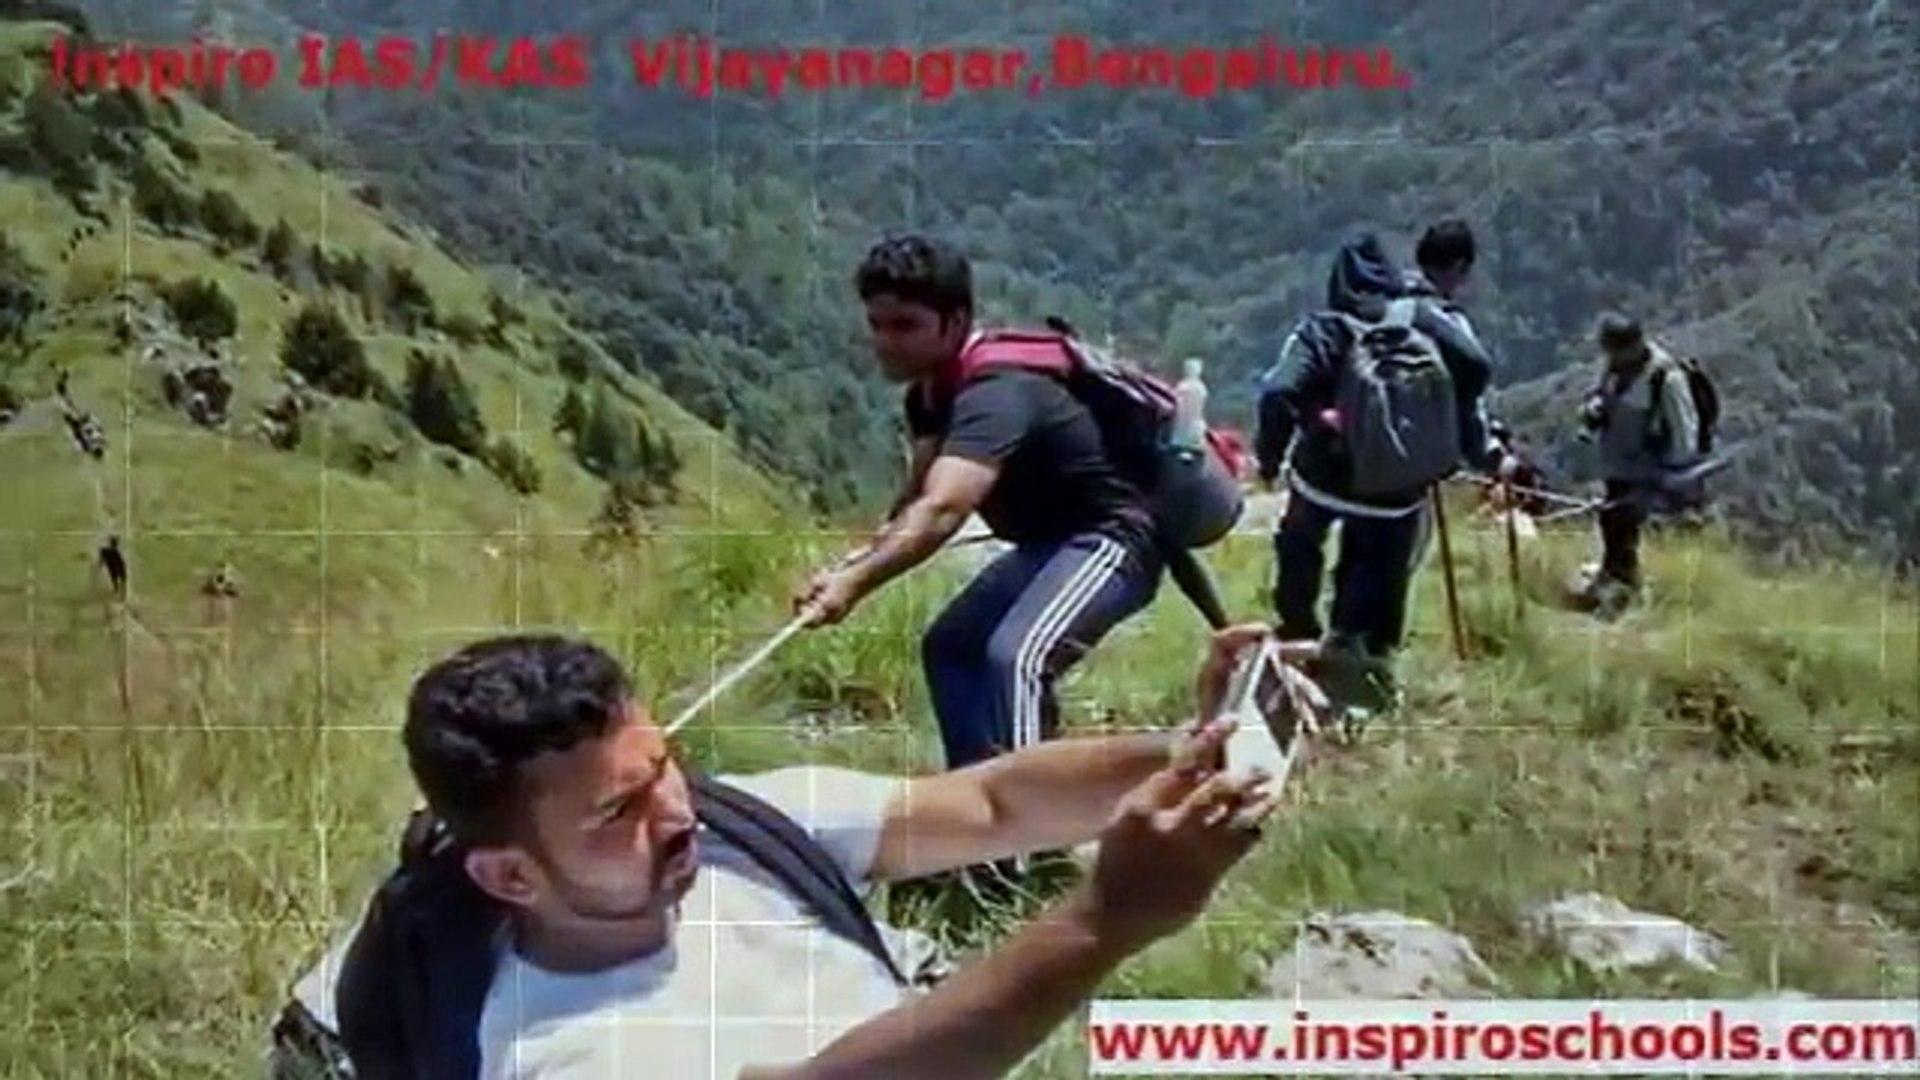 Inspiro IAS motivational video